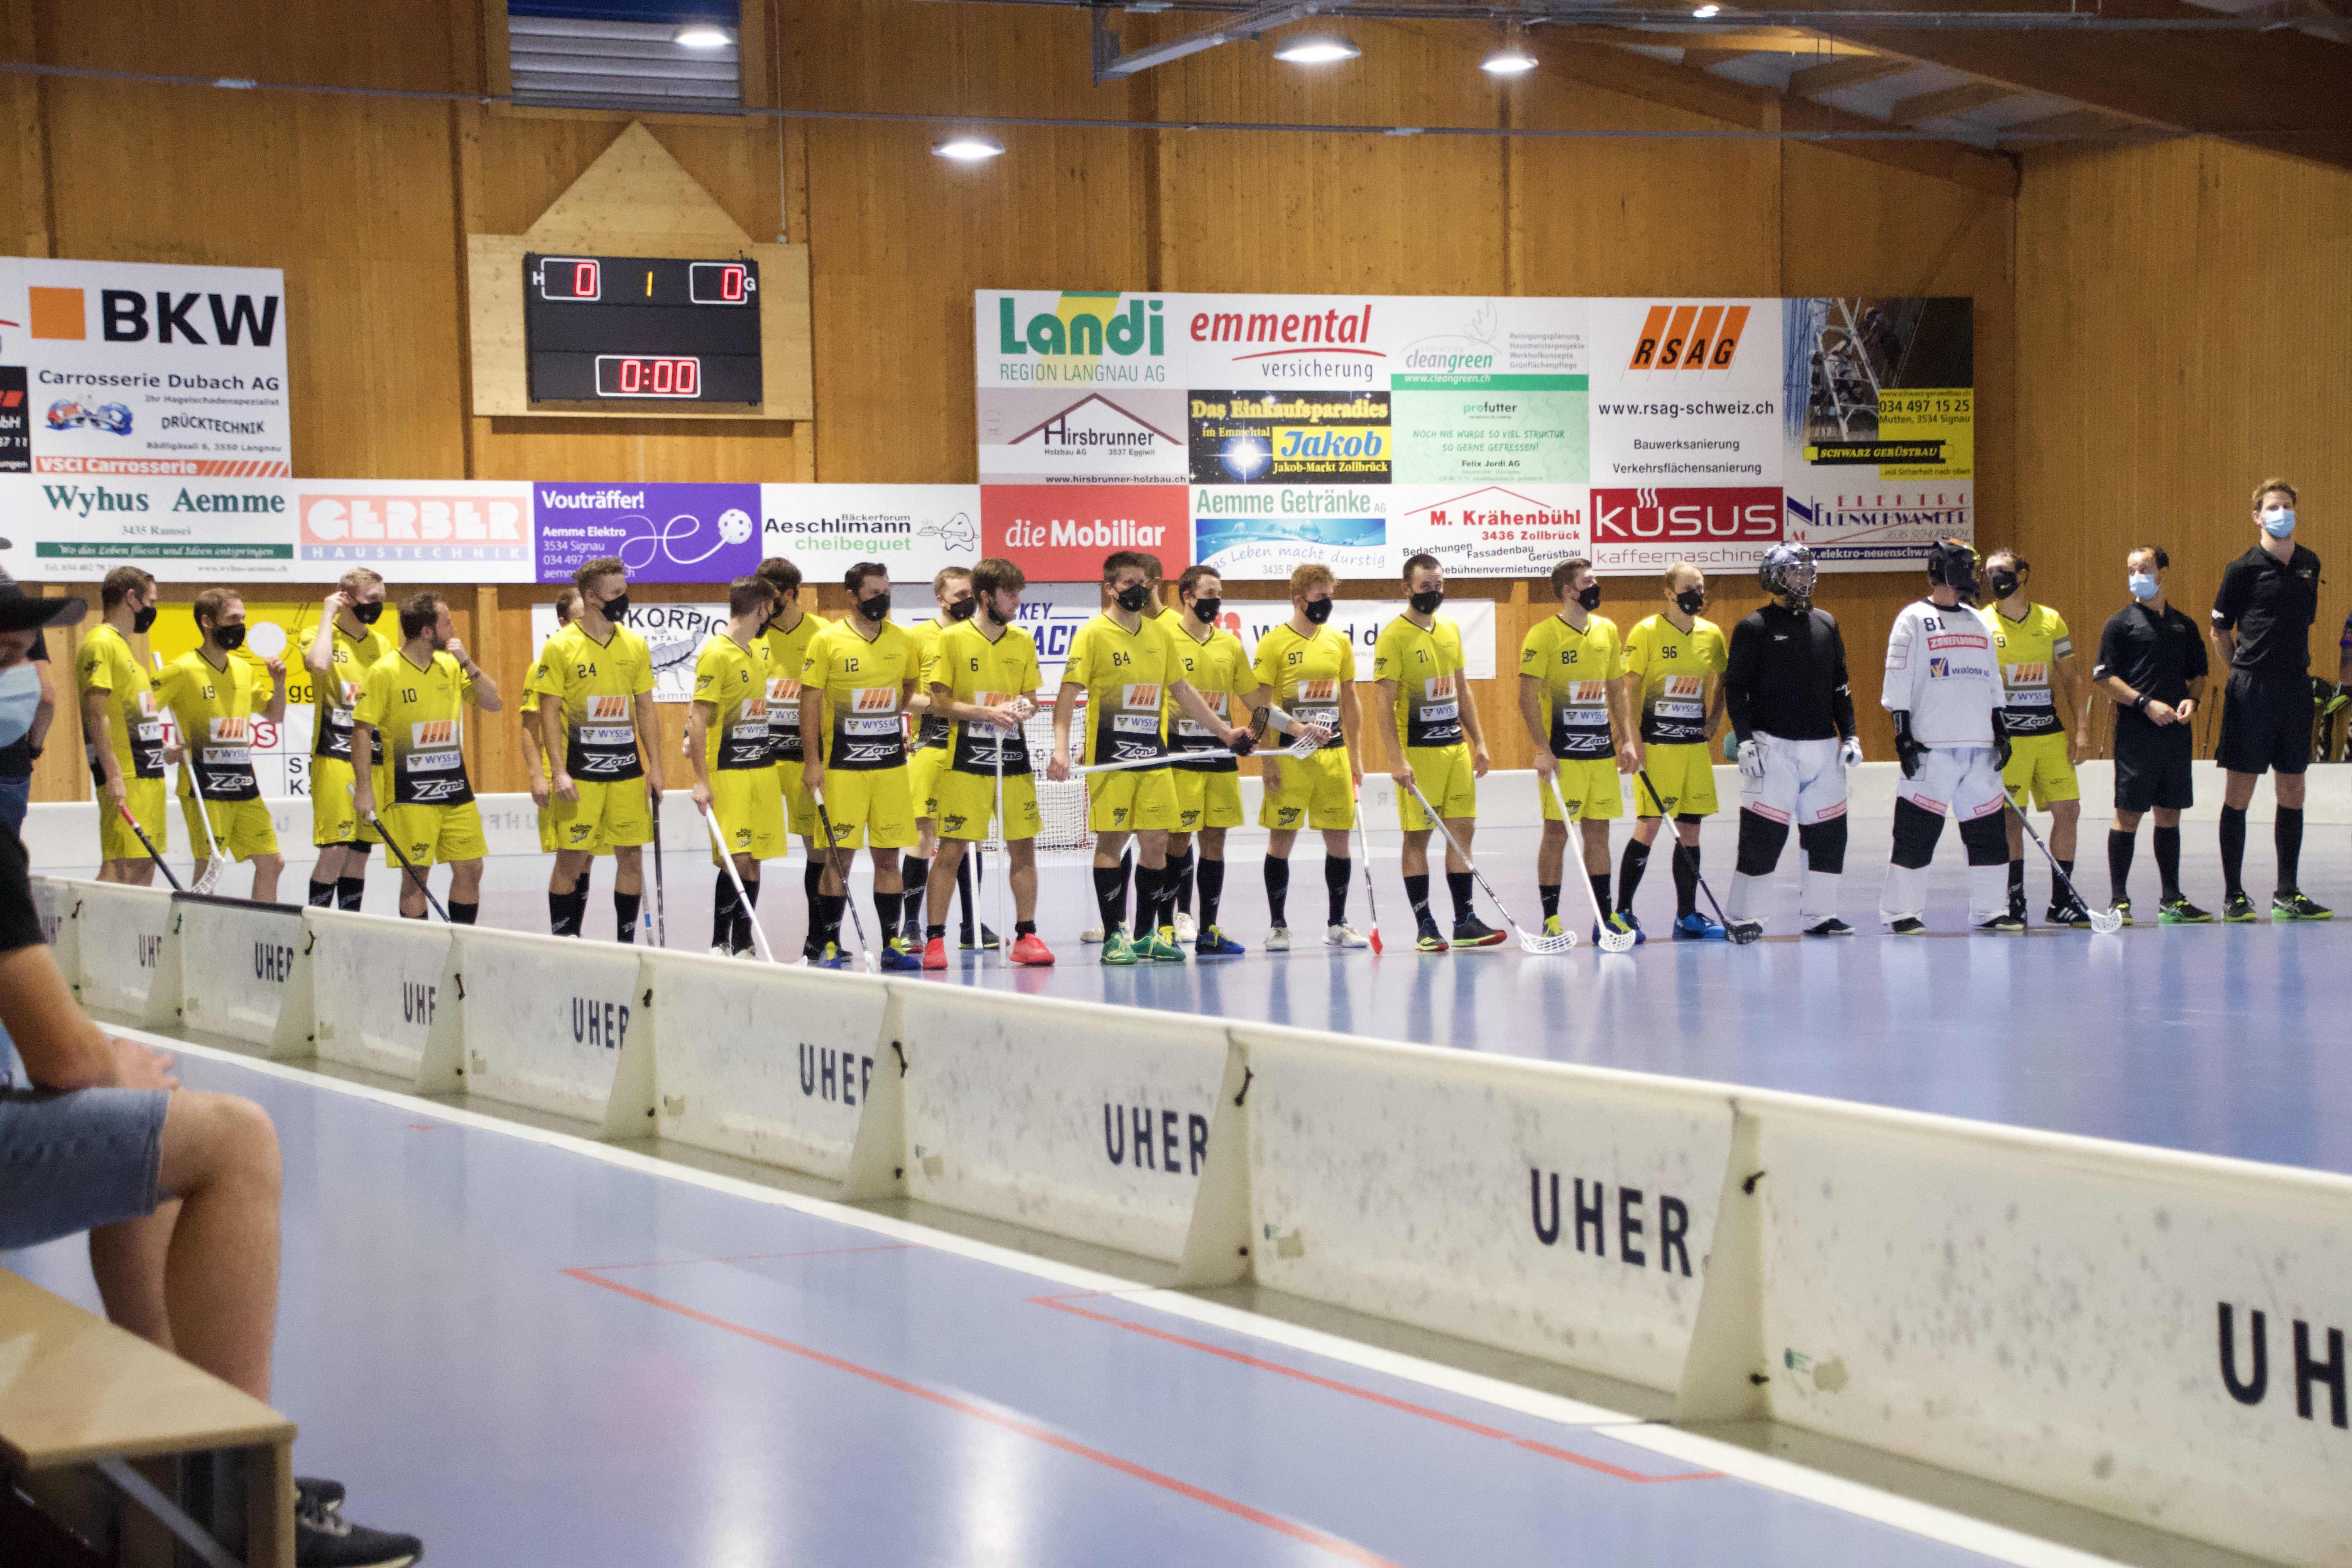 Herren l - Tinico Unihockey Saison 2020 / 2021